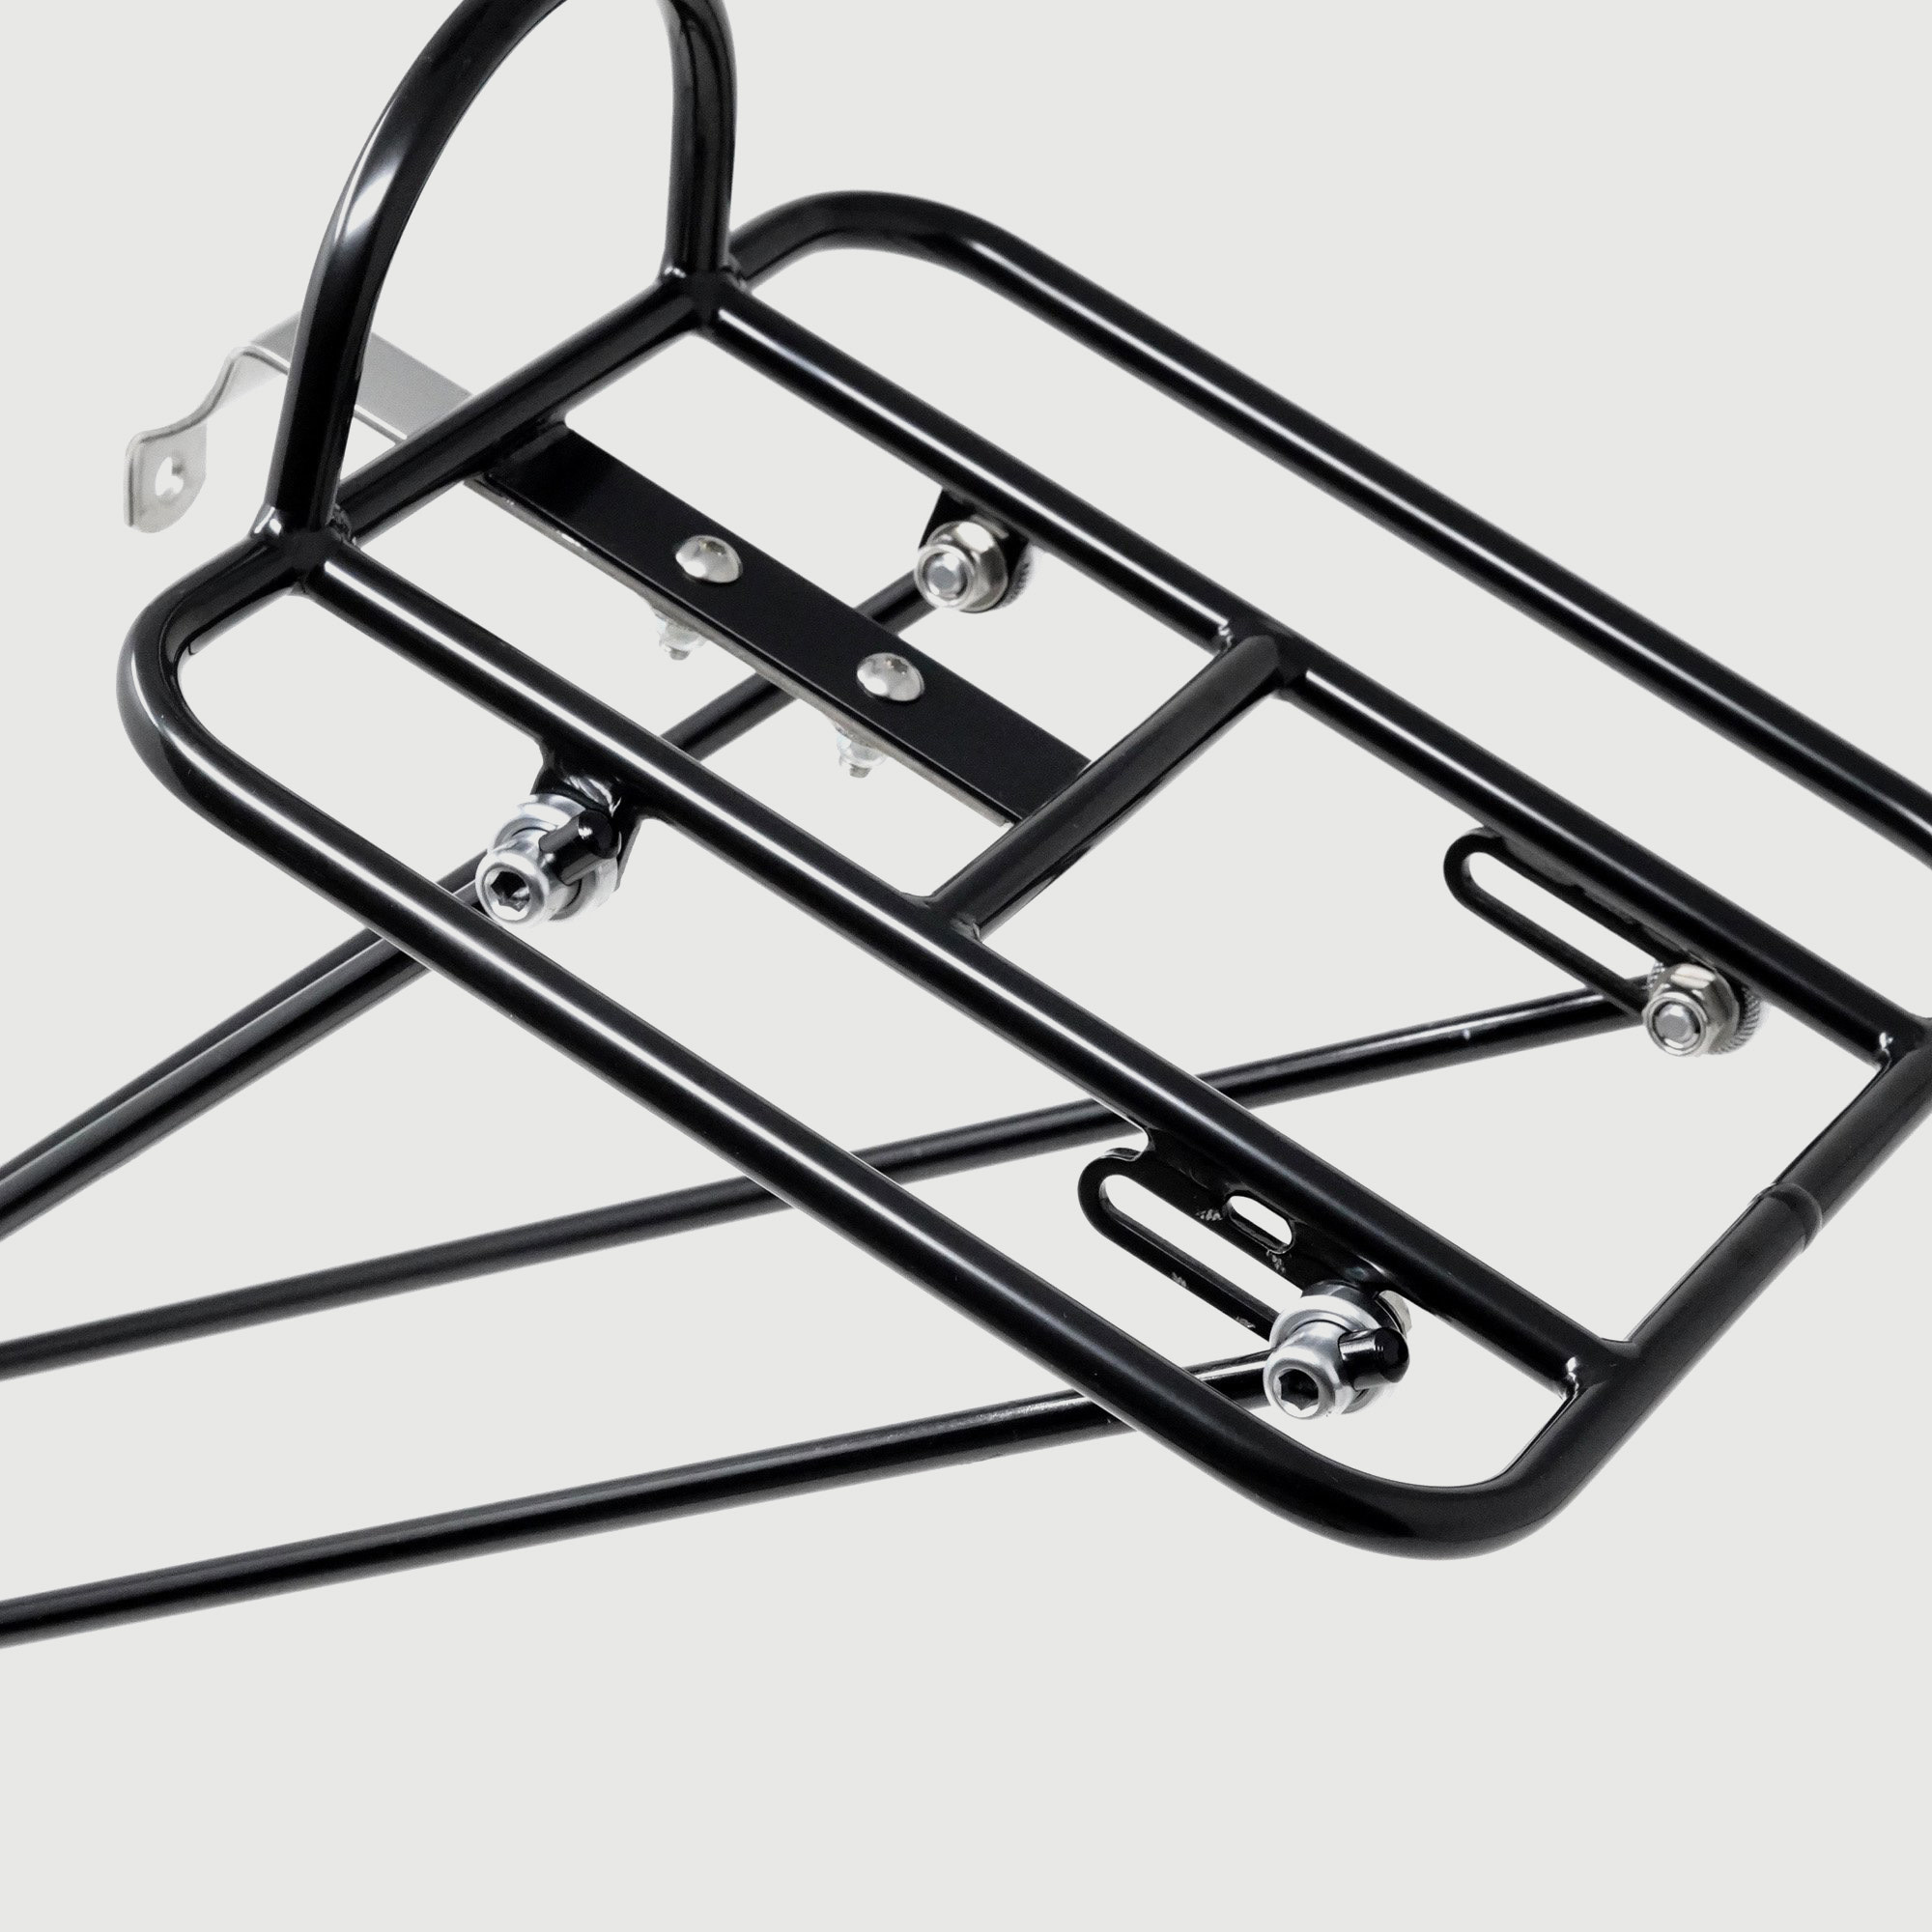 Sim Works Sim Works by Nitto - Obento front rack